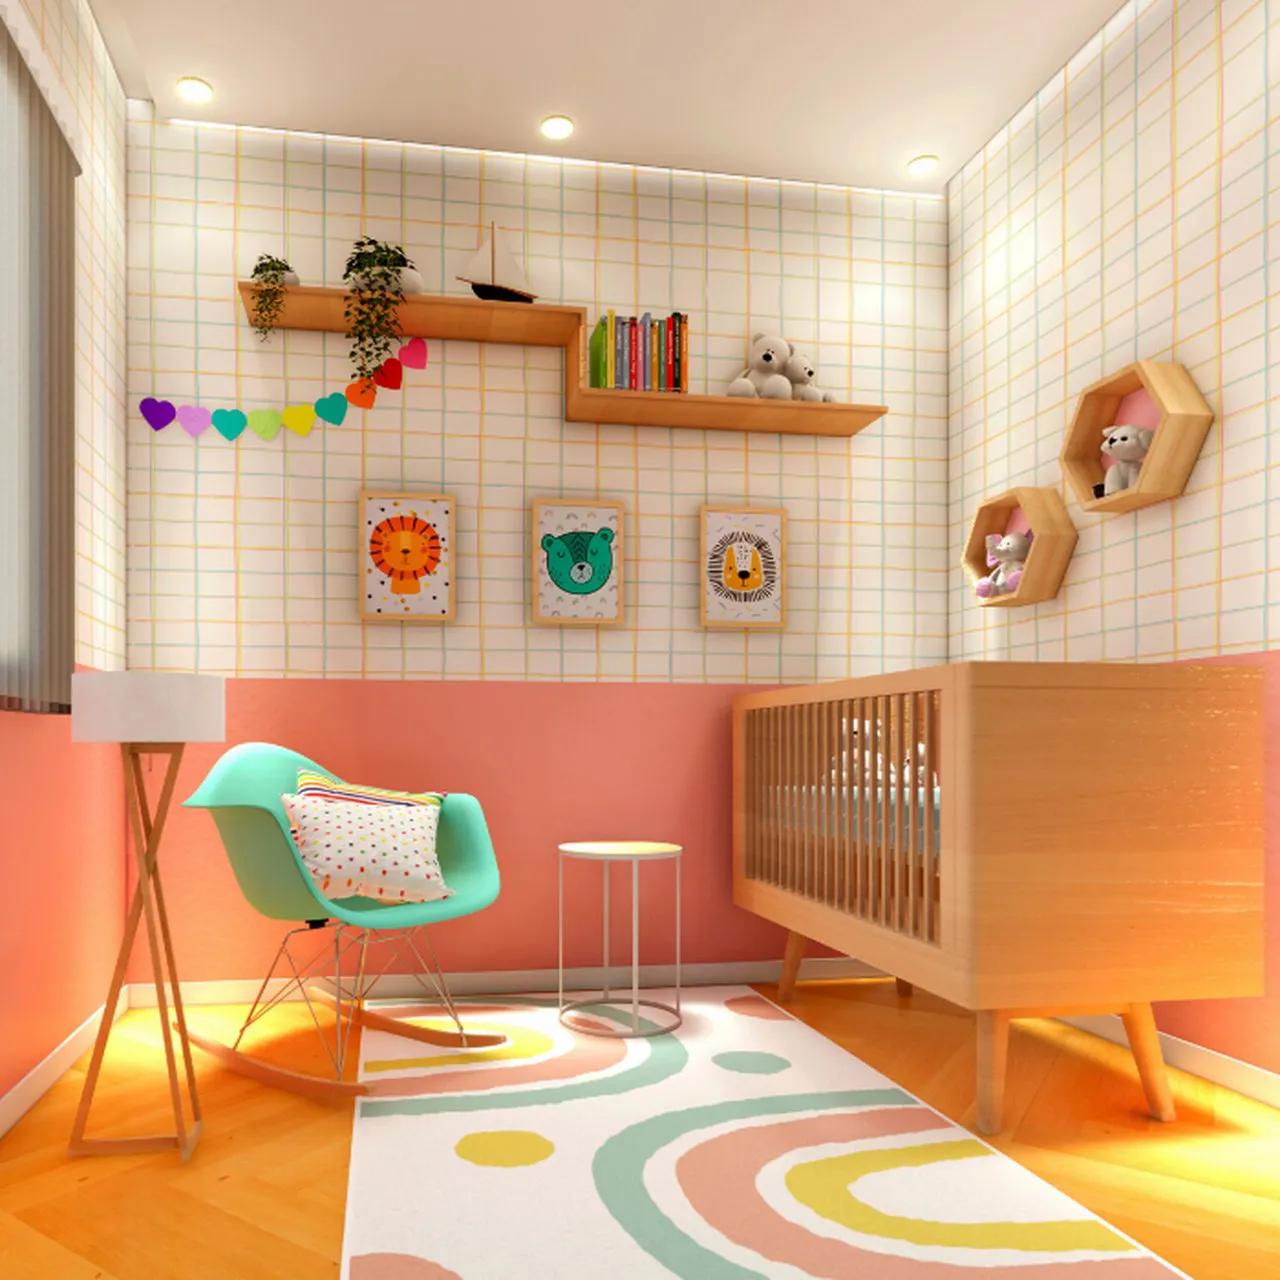 Tapete quarto infantil 100 x 150 cm estampa Arco Íris Candy